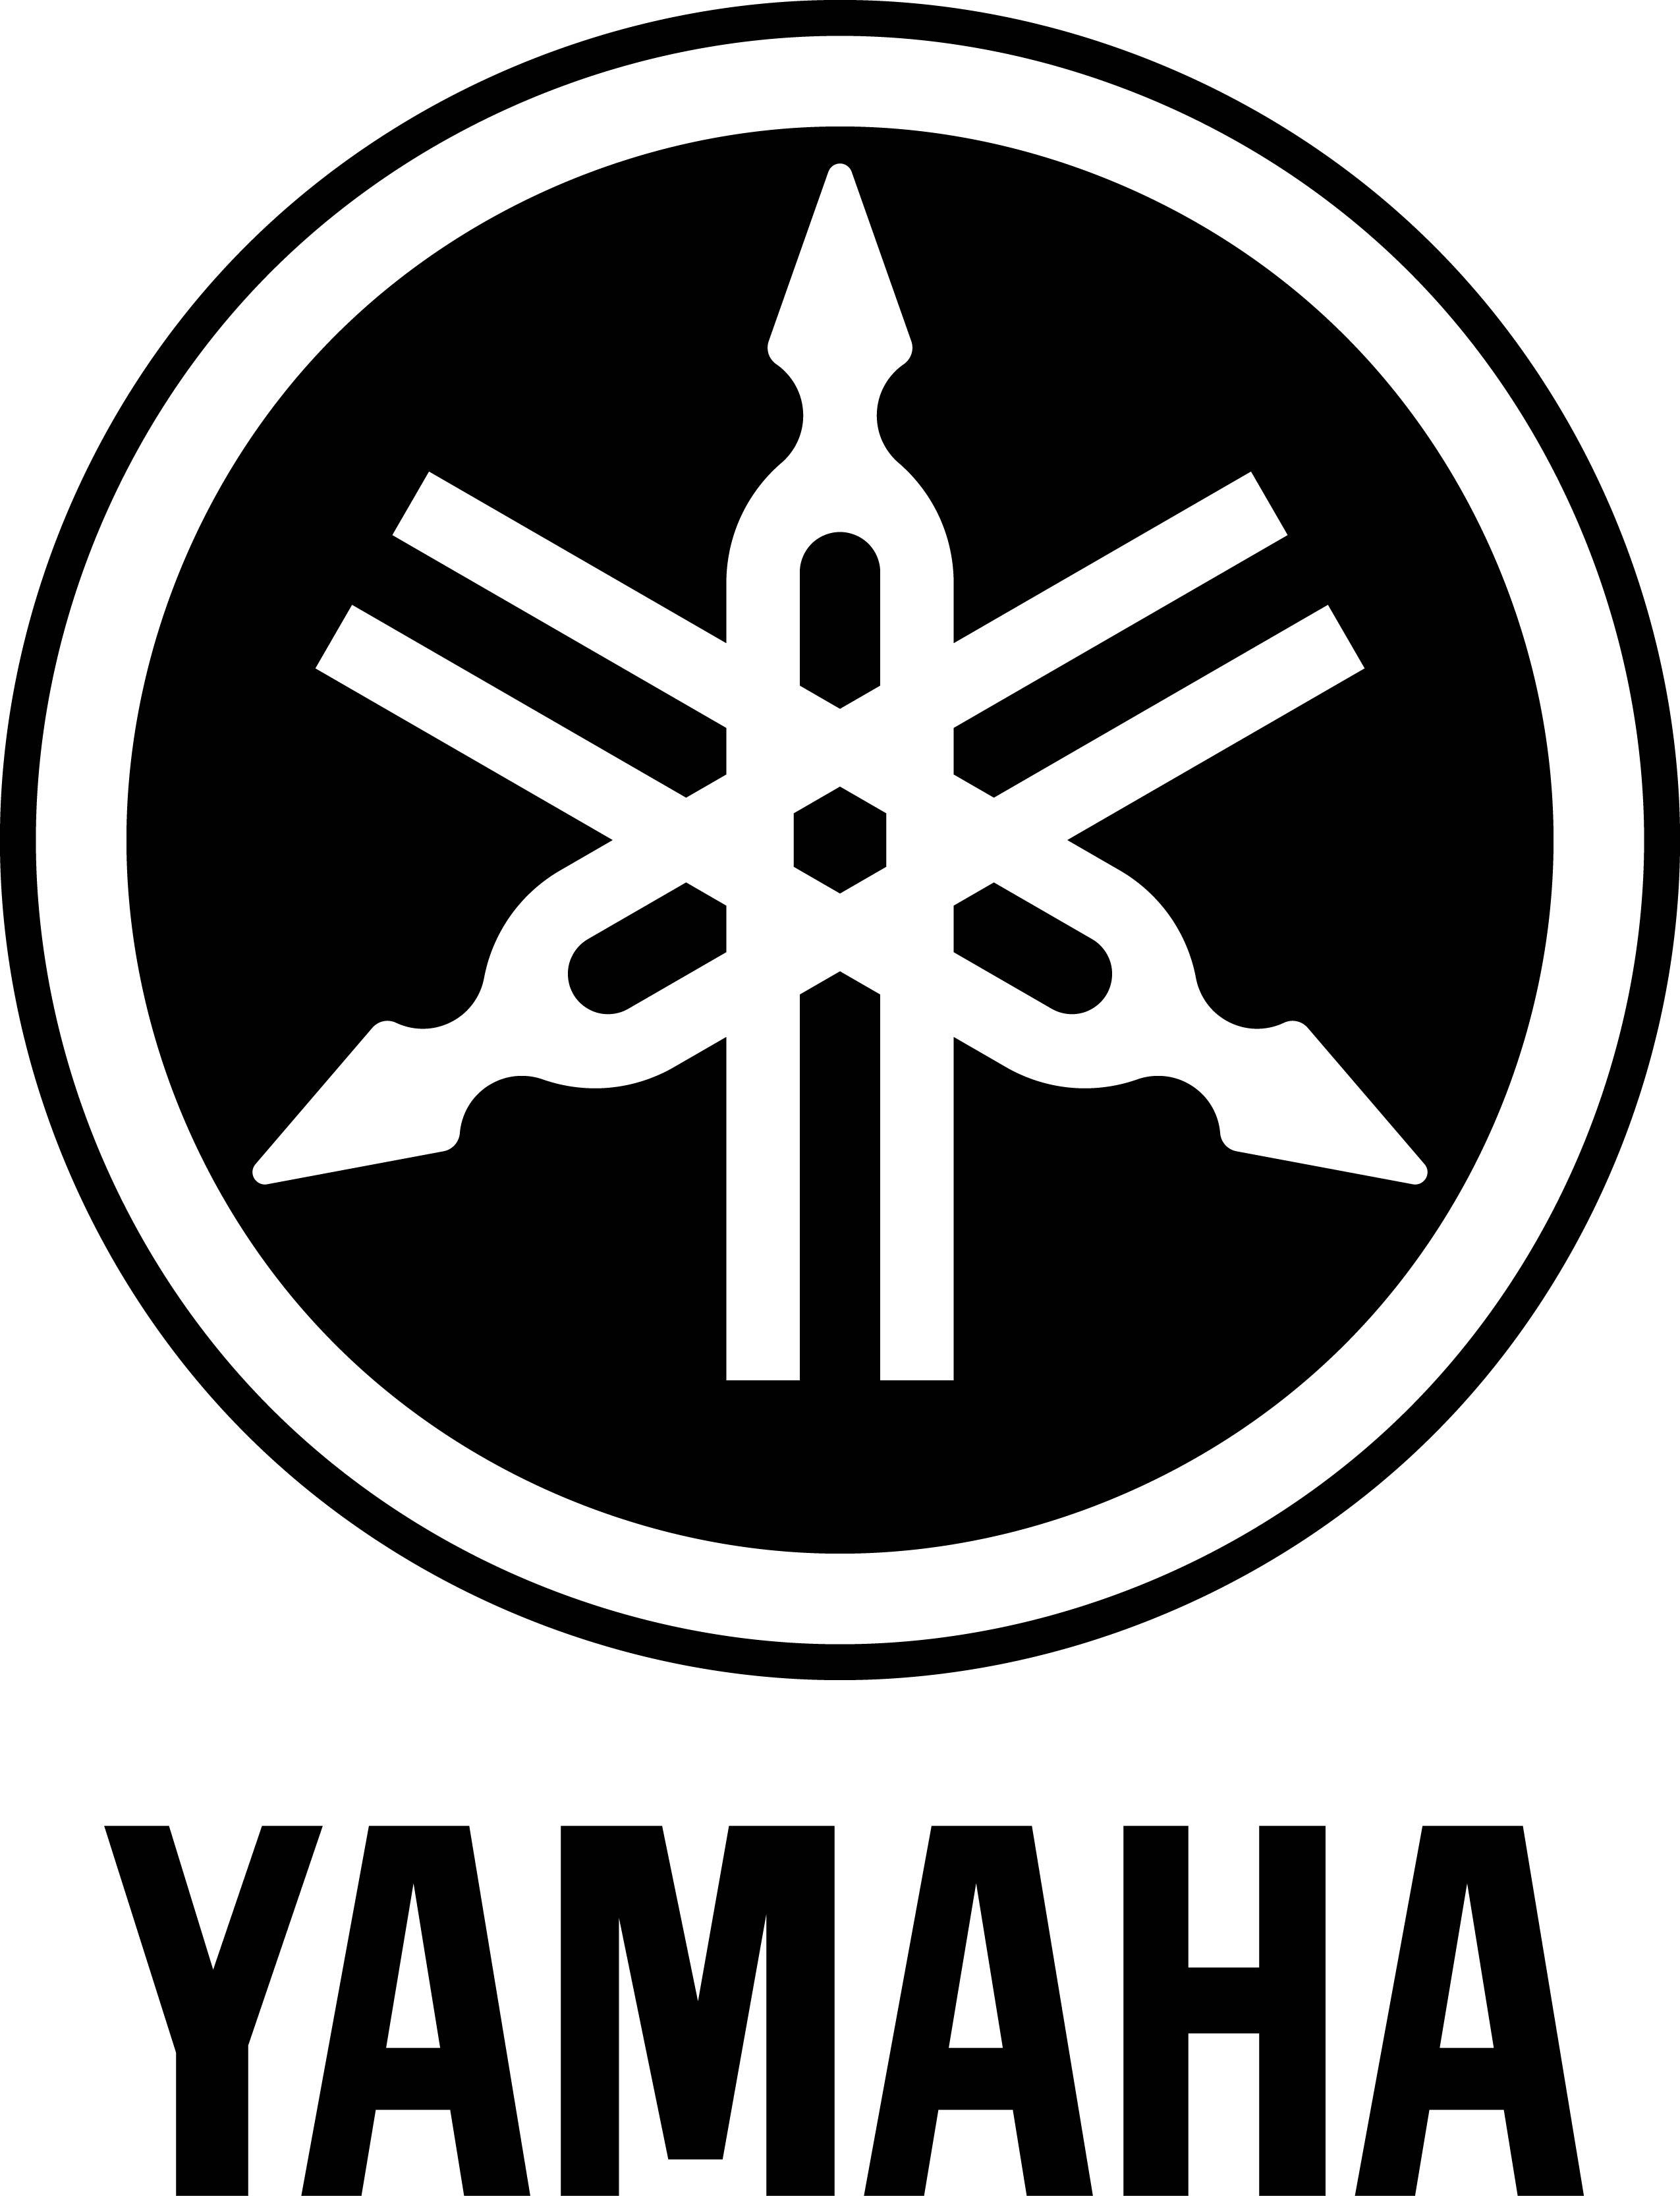 yamaha-2-stroke-parts.jpg